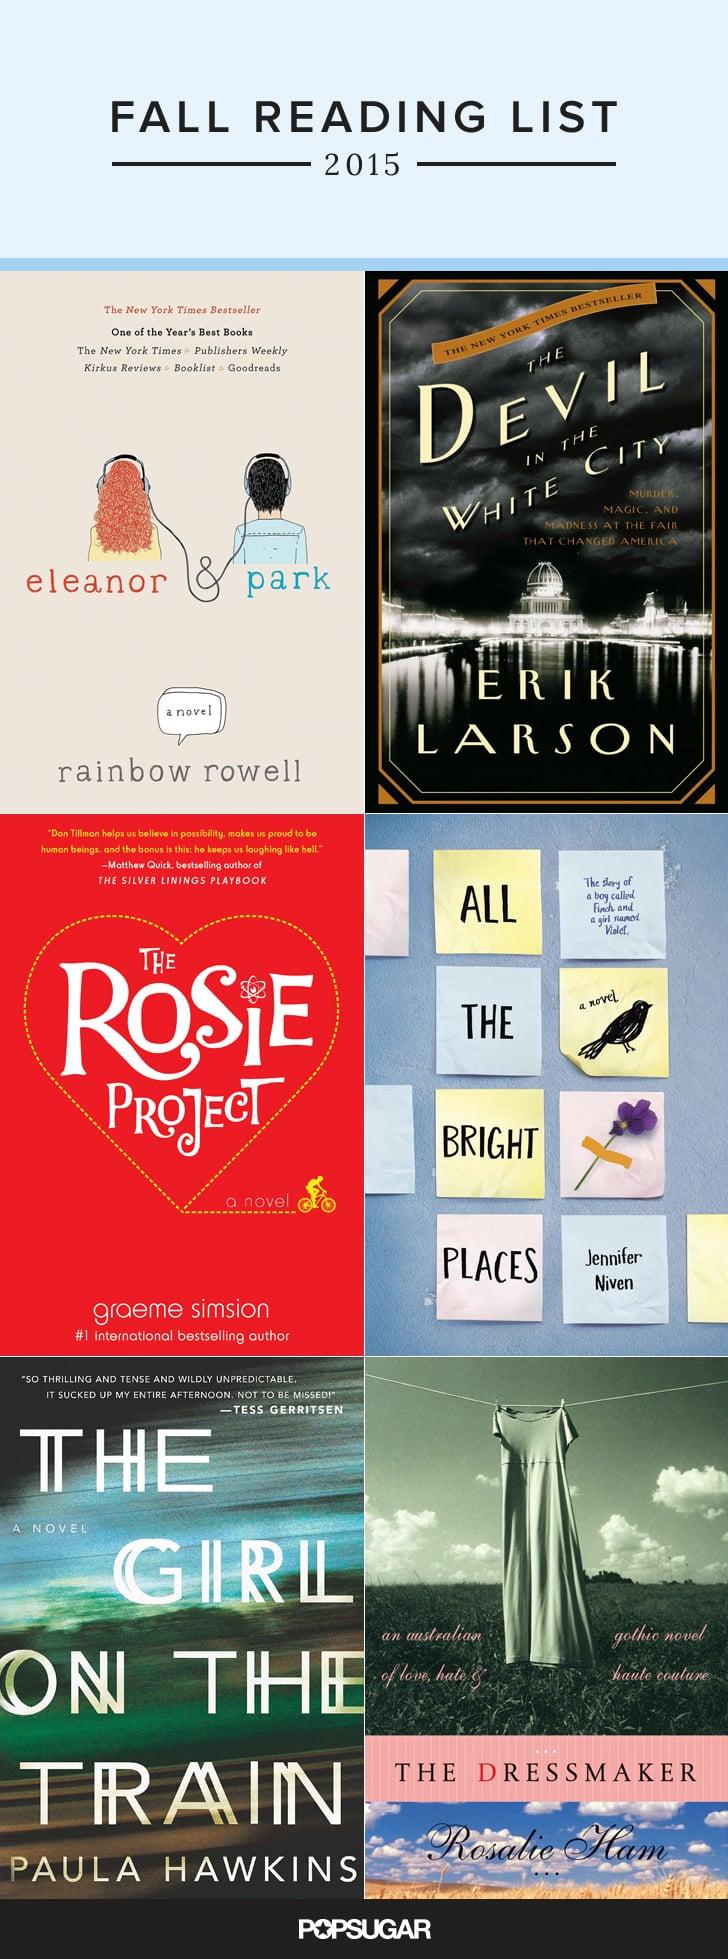 Fall Reading List